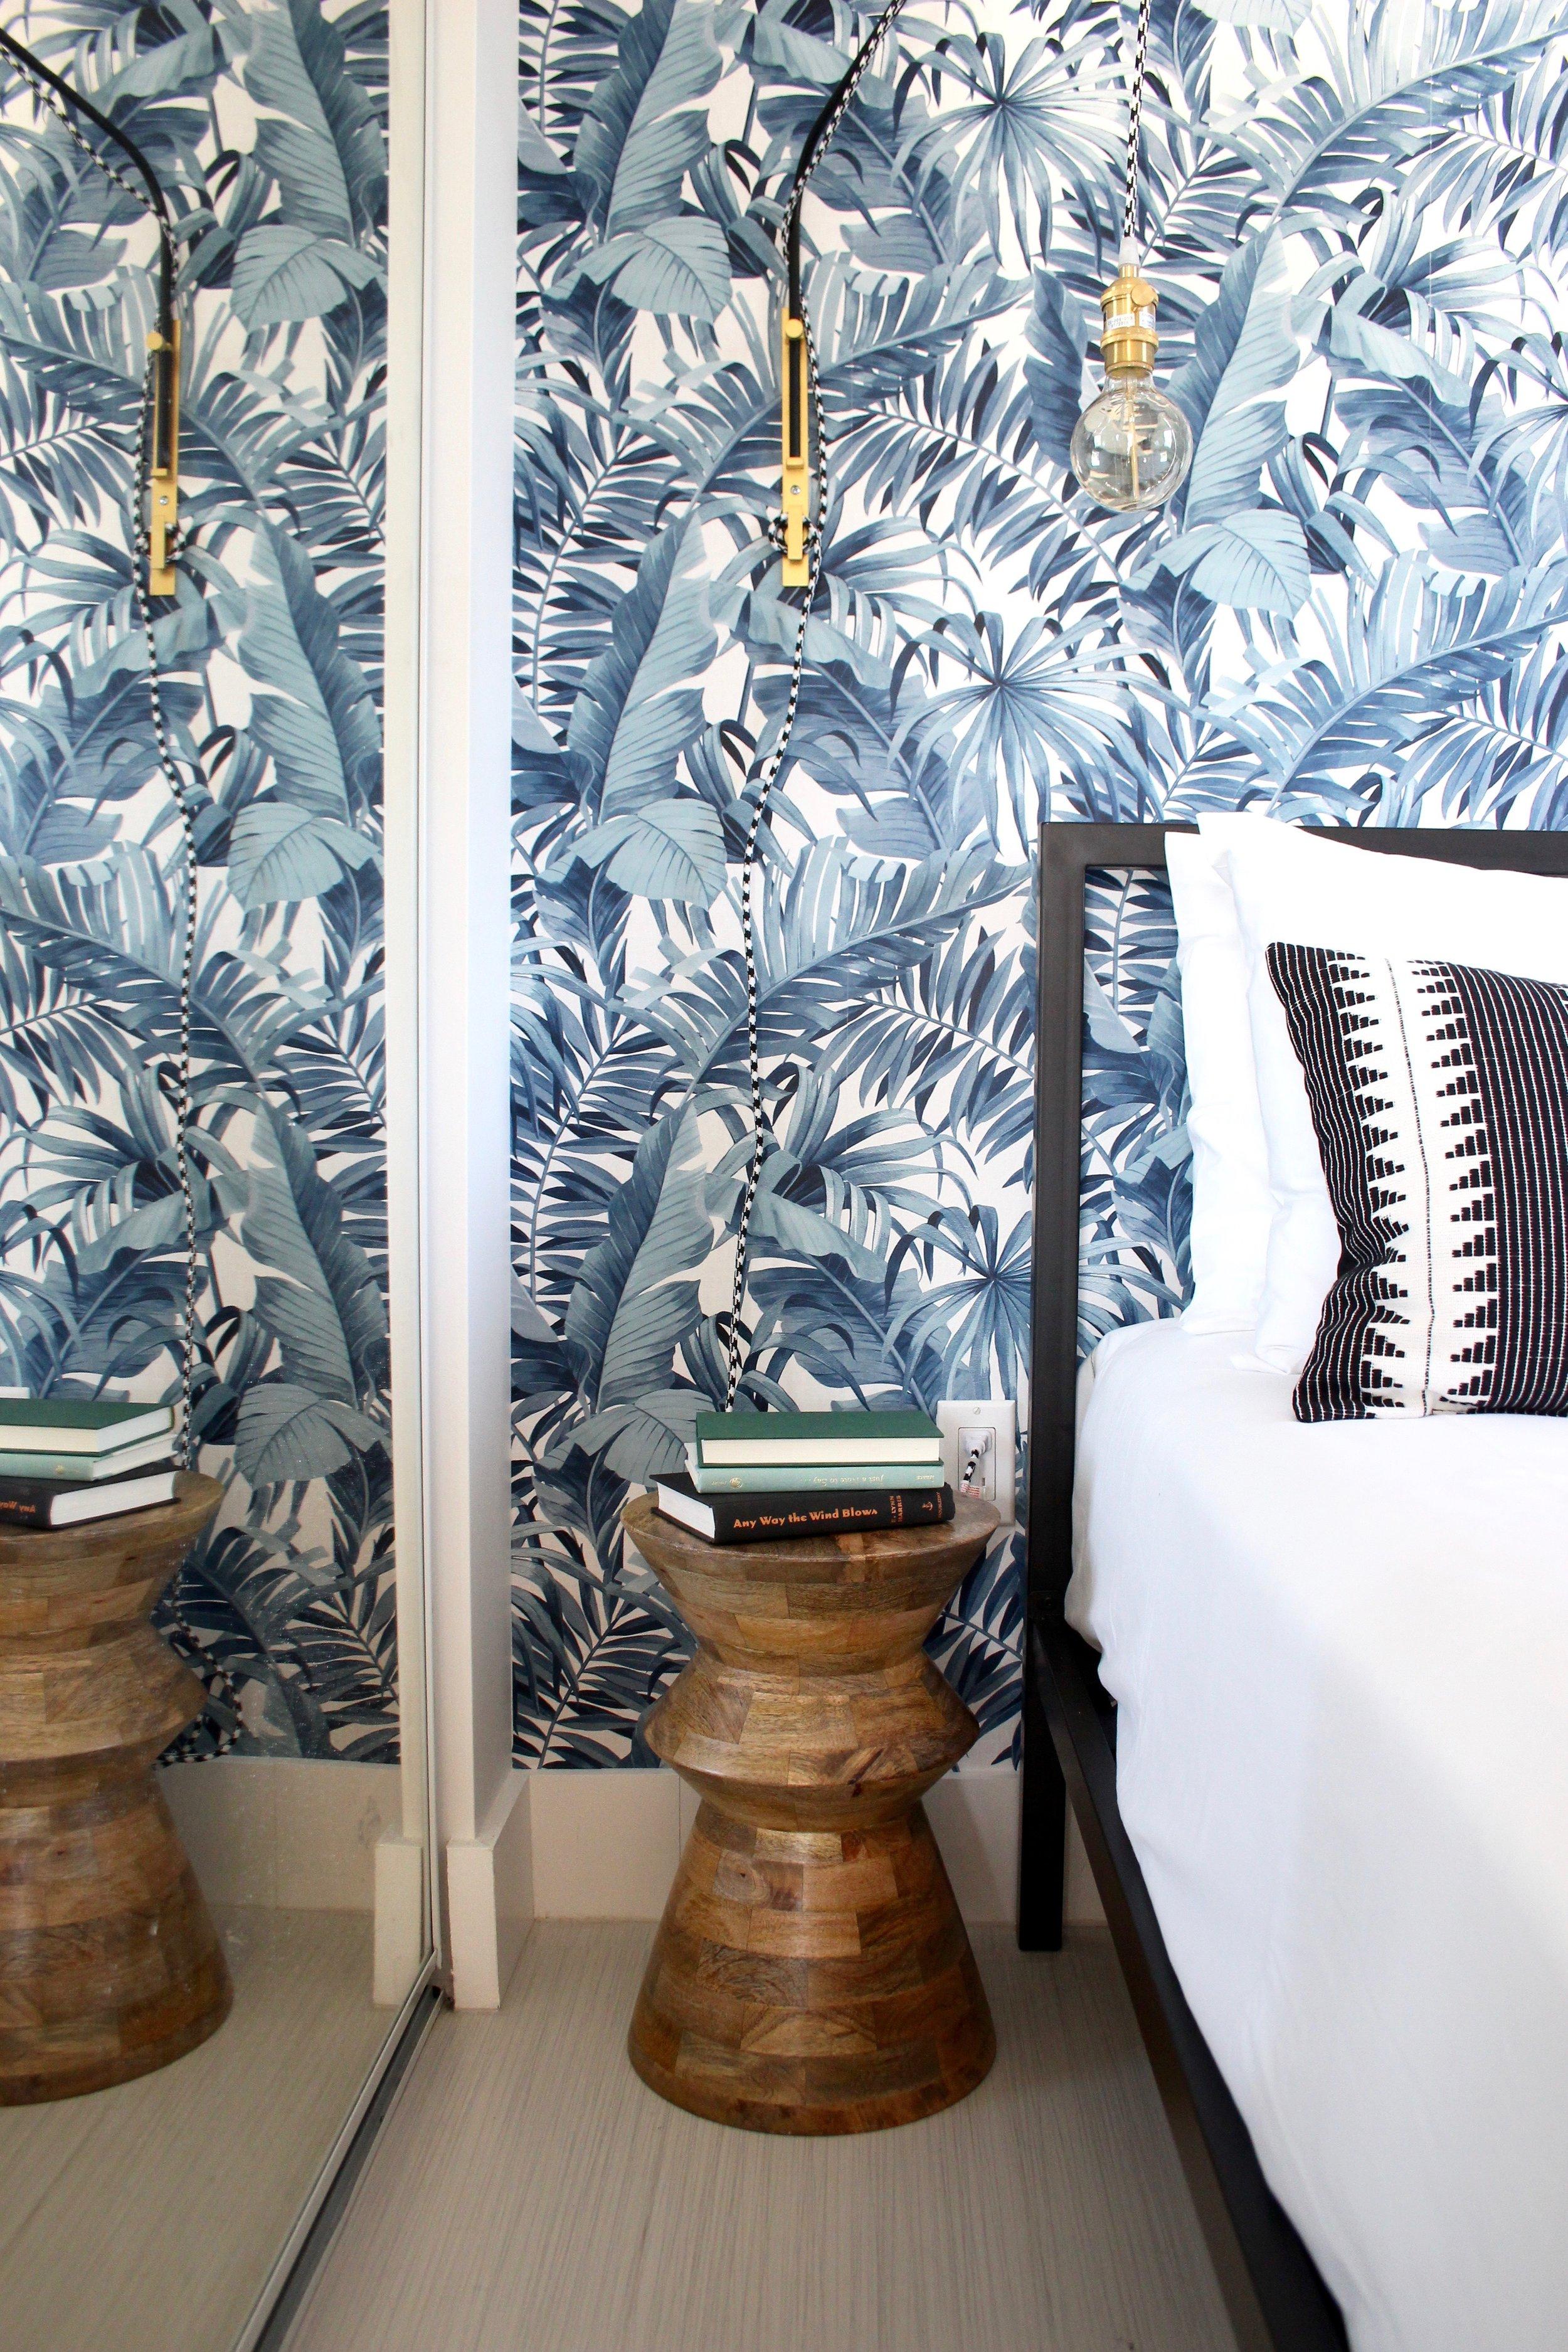 whimsical wynwood studio - bedroom - miami interior design - the habitat collective